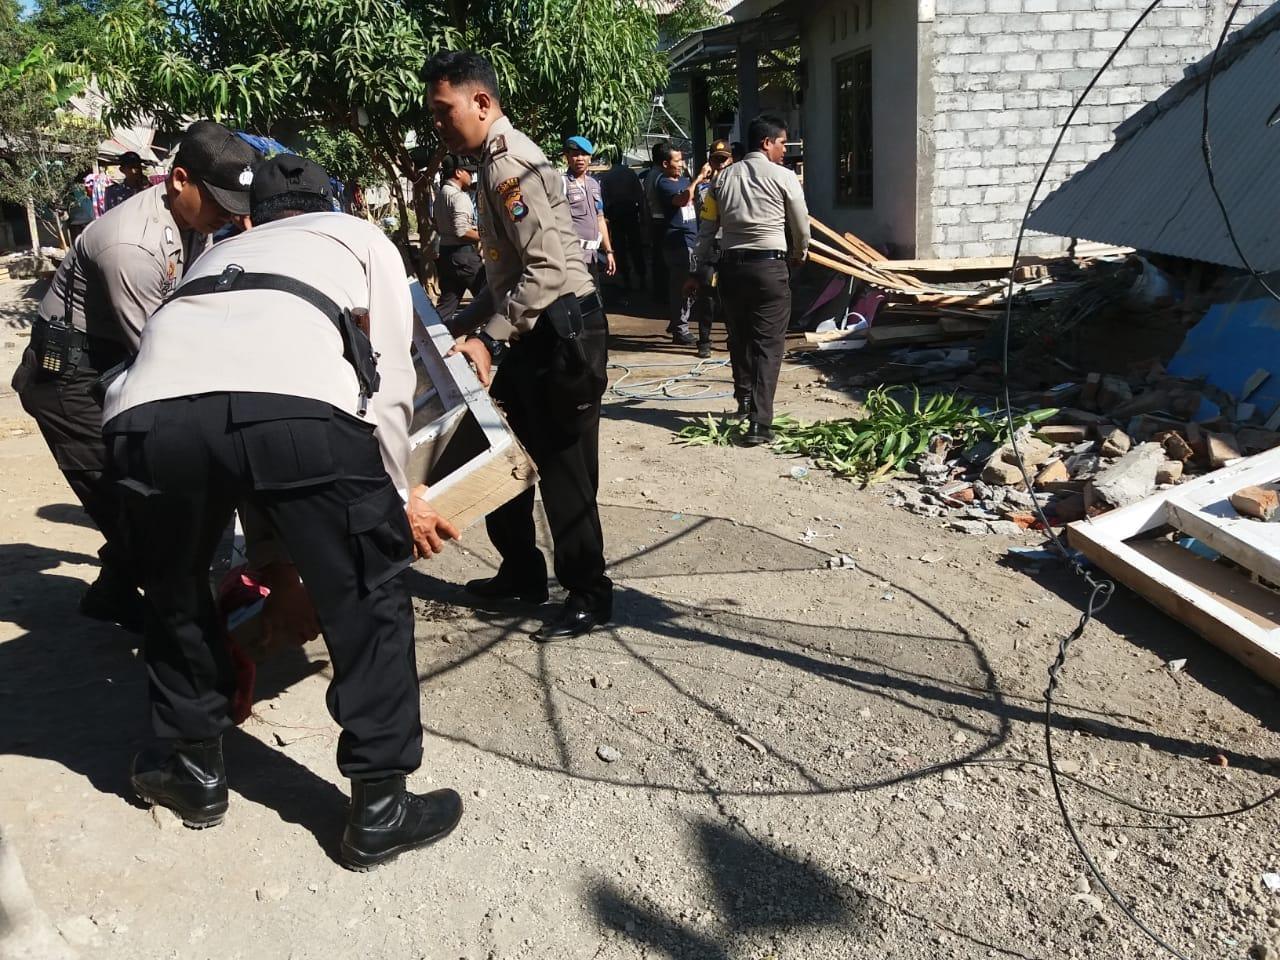 Polres Lotim Turun Tangan Bersihkan Puing Reruntuhan Rumah Korban Untuk Gempa Lombok Ratusan Anggota Timur Bersama Dengan Polsek Wilayah Jajarannya Melakukan Kerja Bakti Gotong Royong